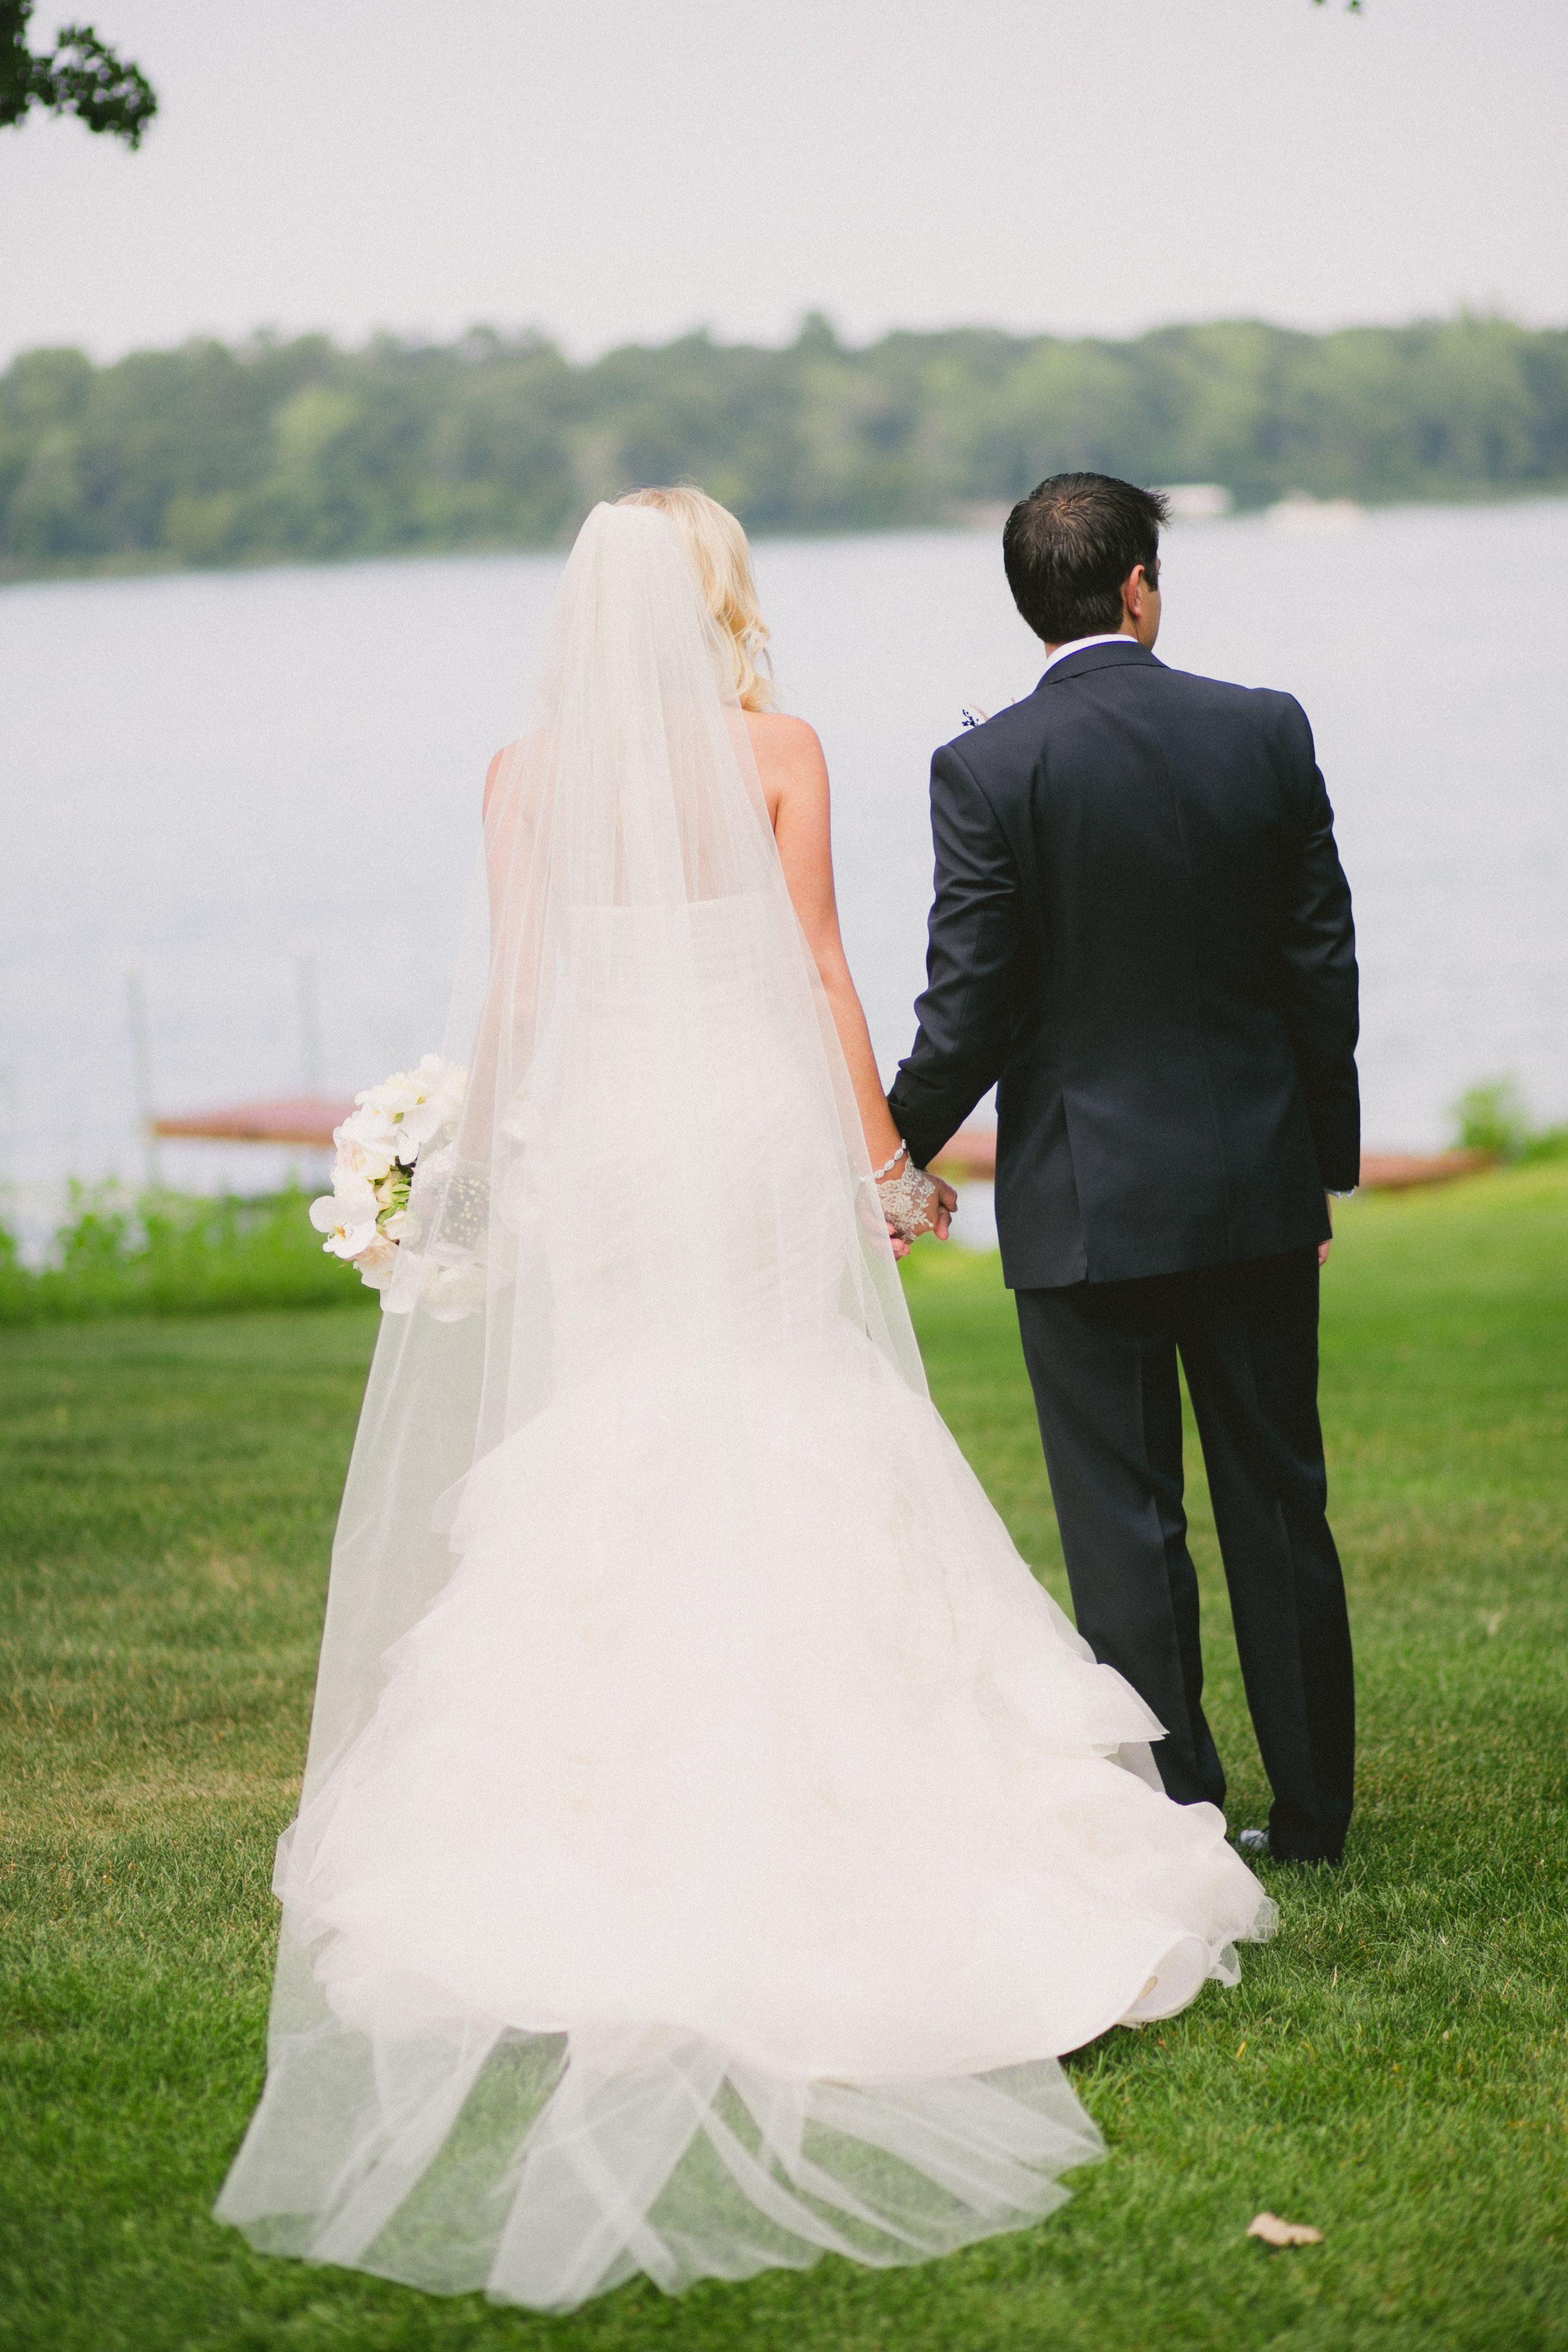 Kelly Brown Weddings Mother Of The Bride Wedding Planning Cross Lake